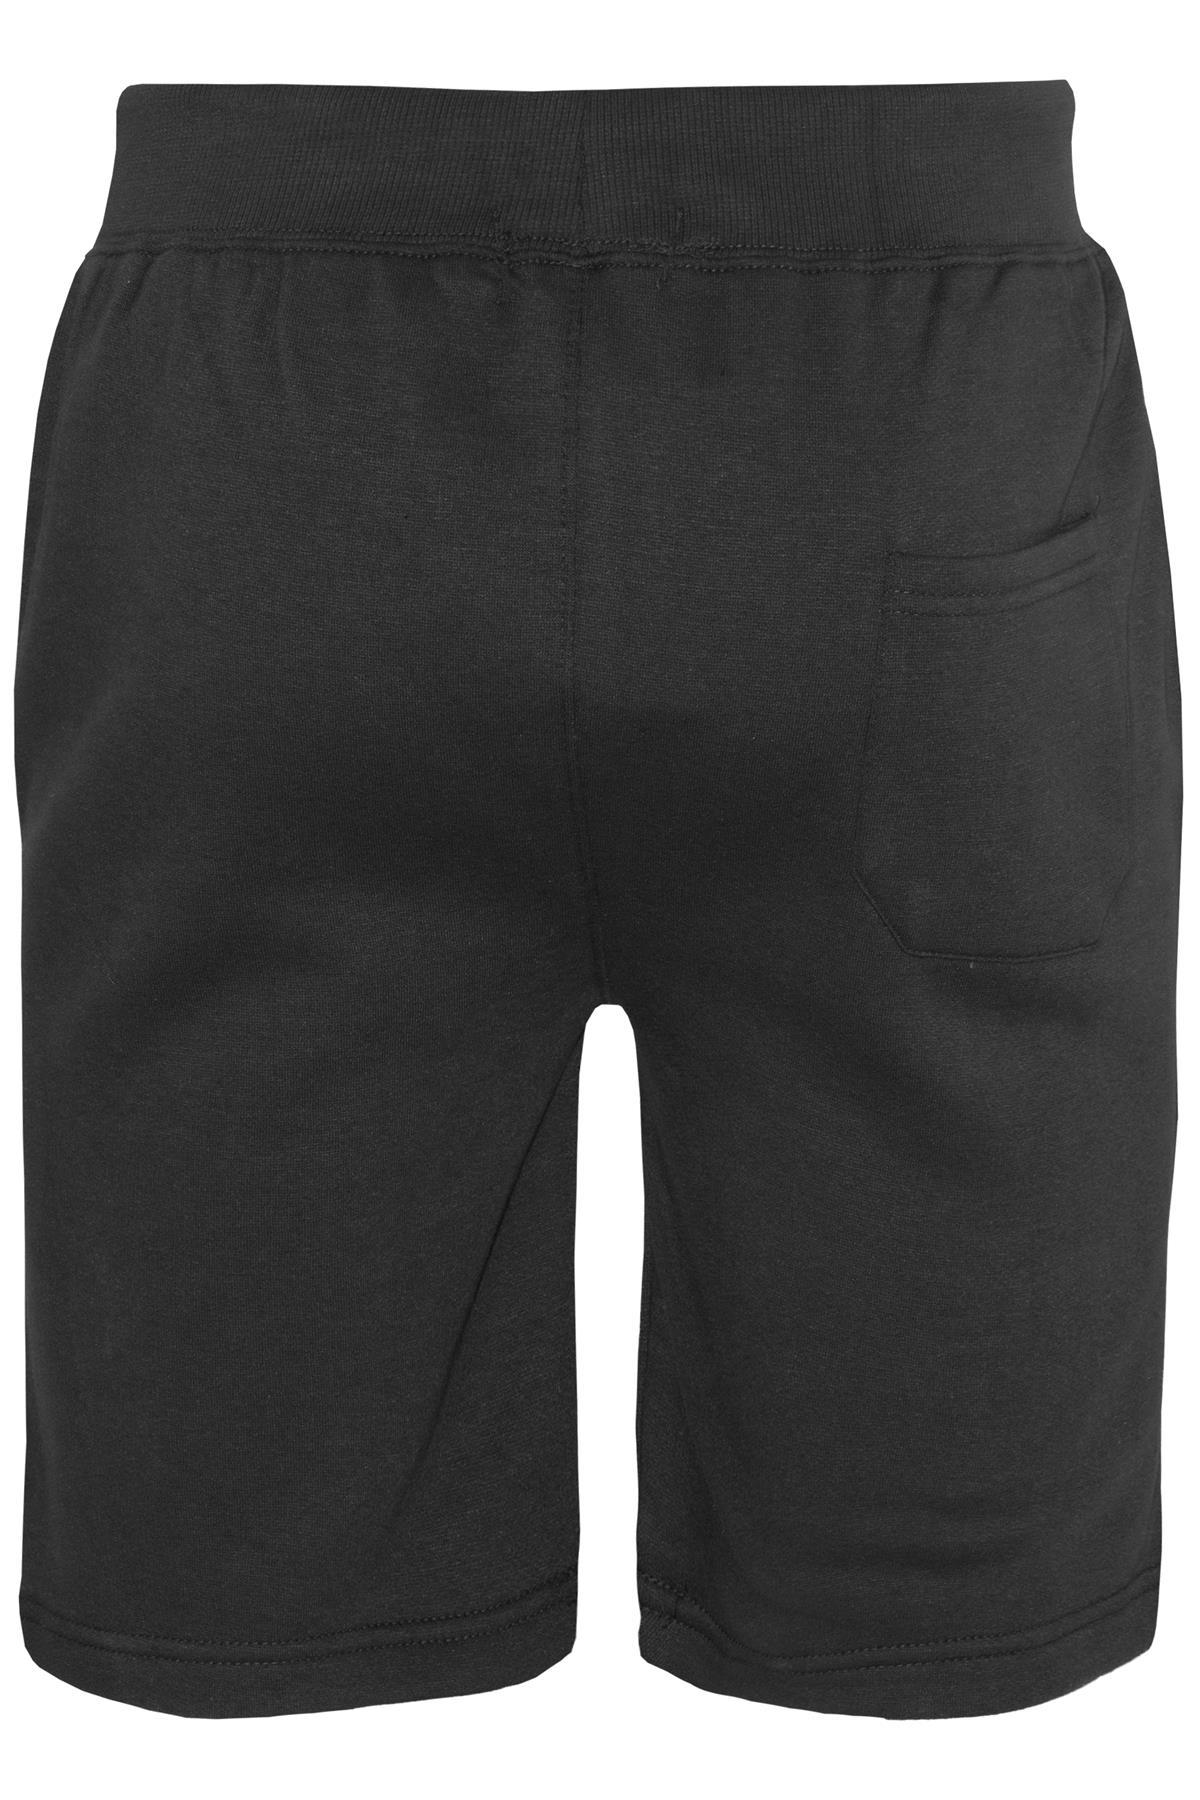 Mens-Contrast-Panel-Running-Summer-Side-Slit-Knee-Length-Fleece-Bottoms-Shorts thumbnail 19